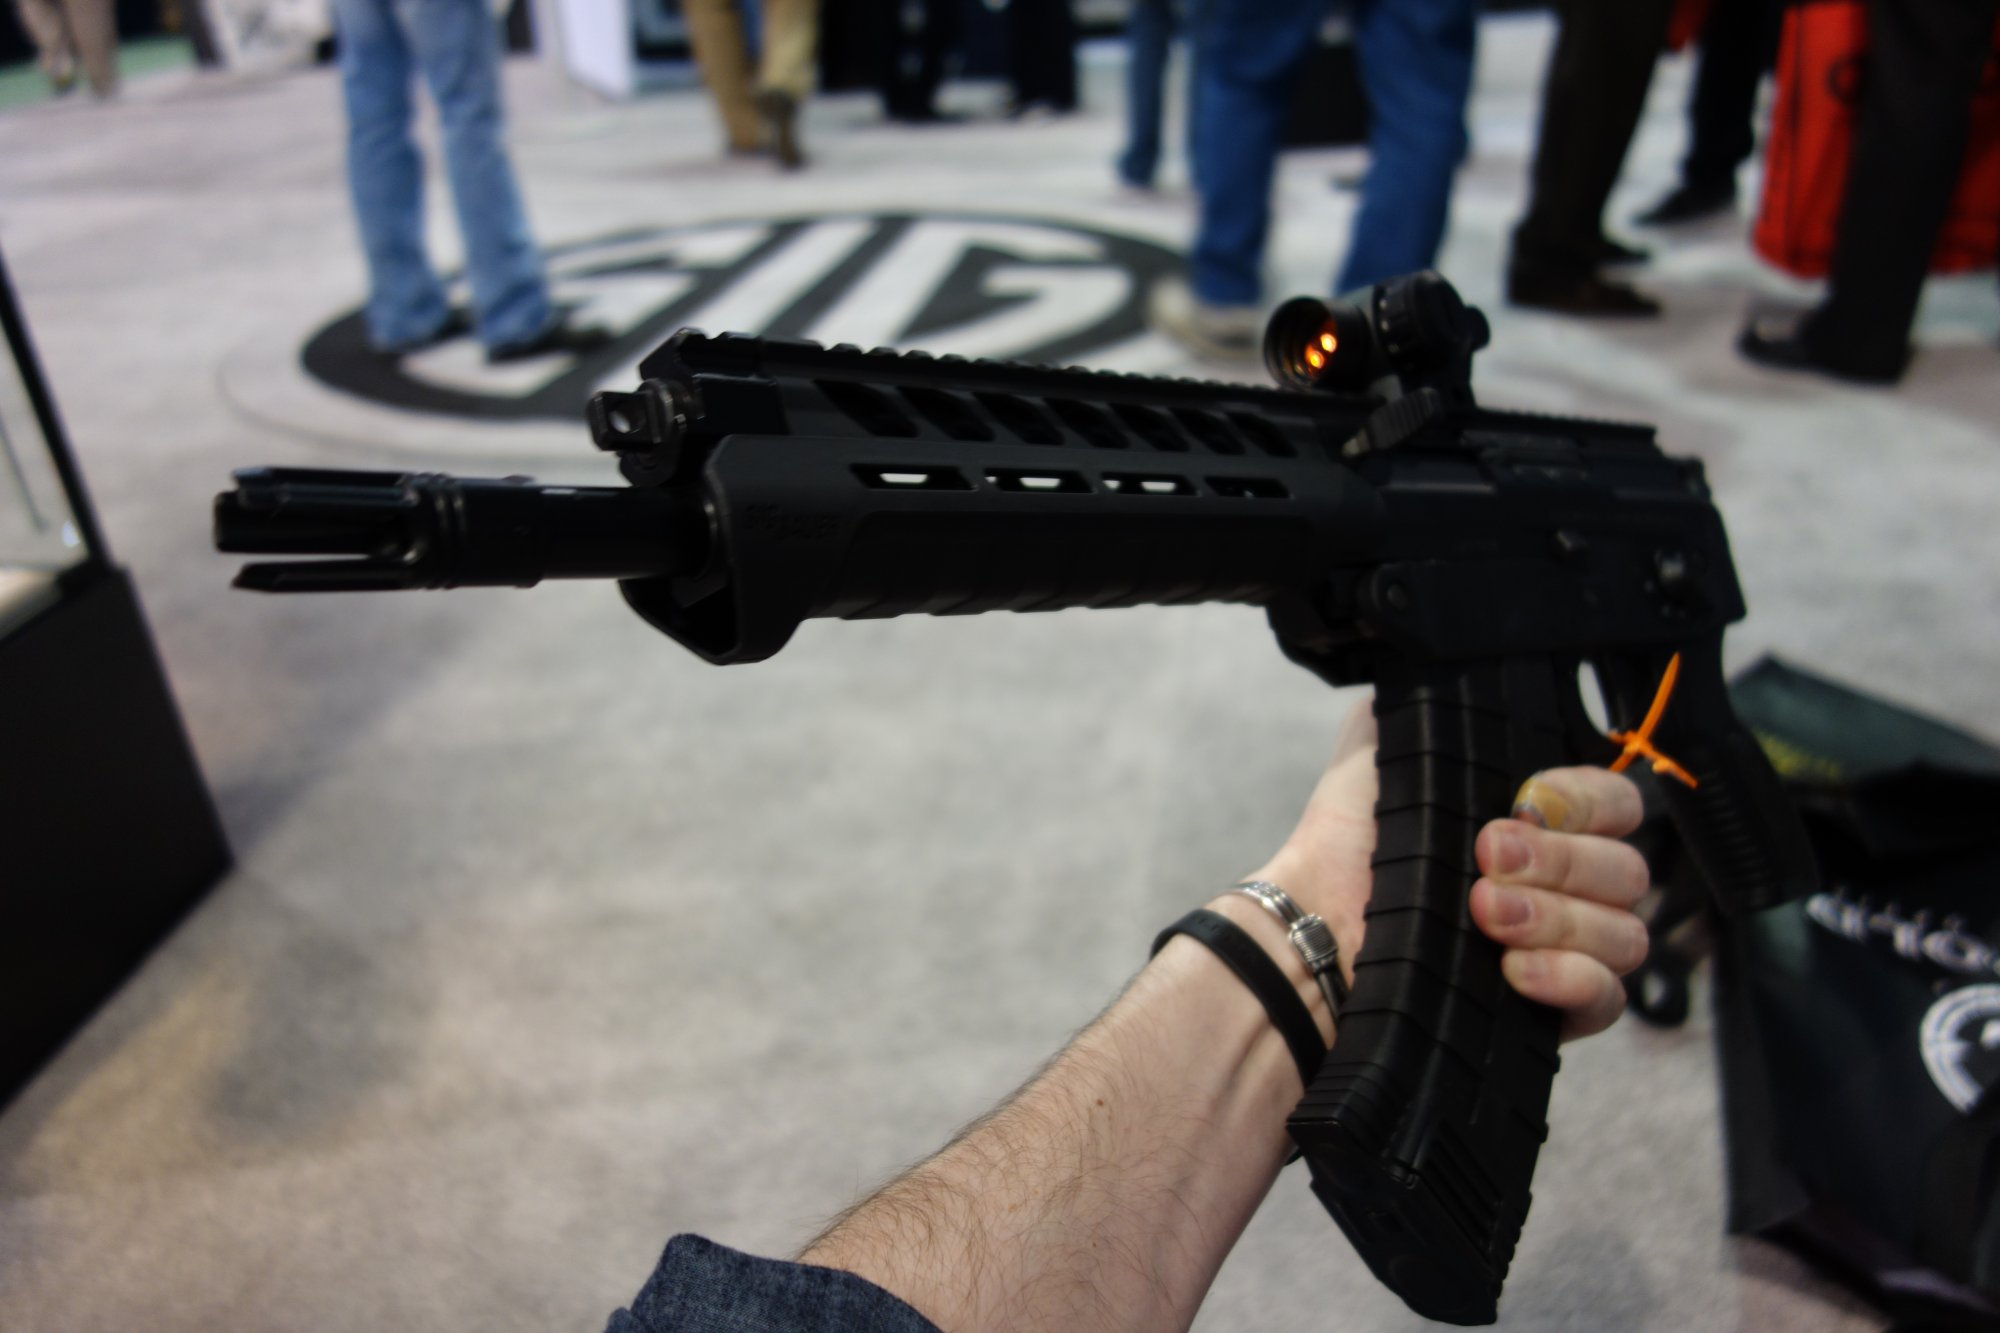 SIG SAUER SIG556xi 7.62x39mm Russian Configuration Semi Auto Only Modular Multi Caliber Combat Tactical Carbine Kalashnikov AK 47 AKM SHOT Show 2014 1 15 14 David Crane DefenseReview.com DR 10 SIG SAUER SIG556xi Modular, Multi Caliber (5.56mm NATO, 300 AAC Blackout/300BLK, 7.62x39mm Russian) Gas Piston/Op Rod Combat/Tactical Rifle/Carbine/SBR with Kalashnikov AK 47/AKM Configuration Capability!